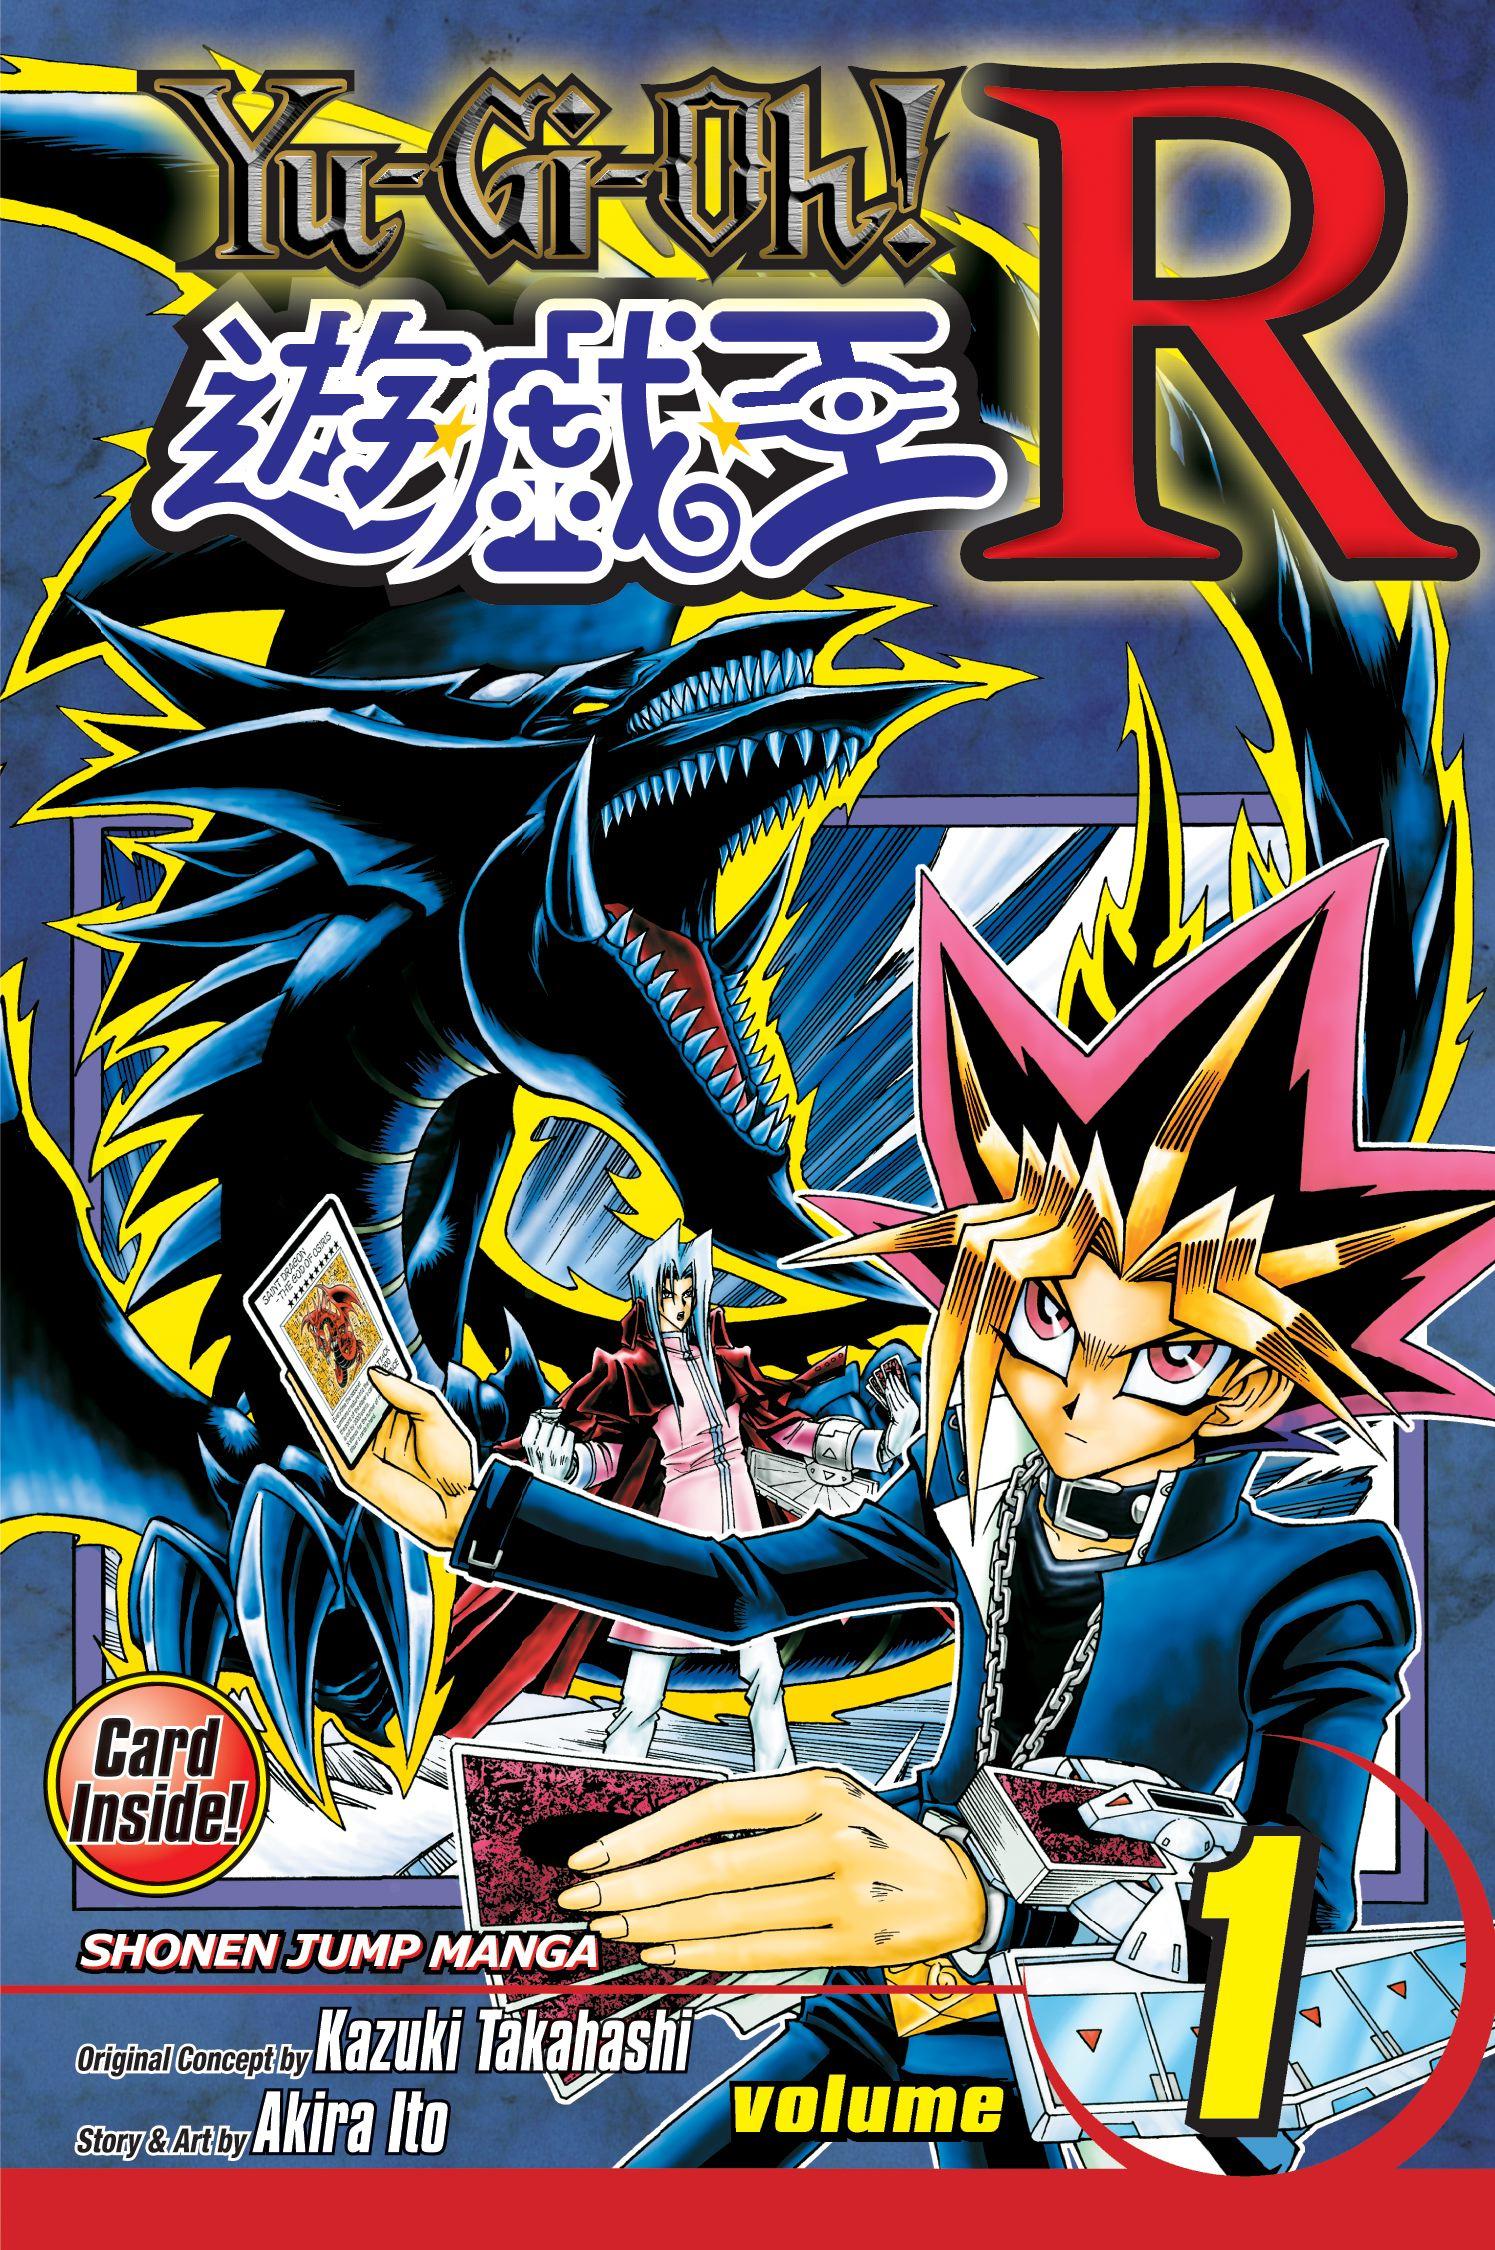 Yu-Gi-Oh! R Volume 1 promotional card